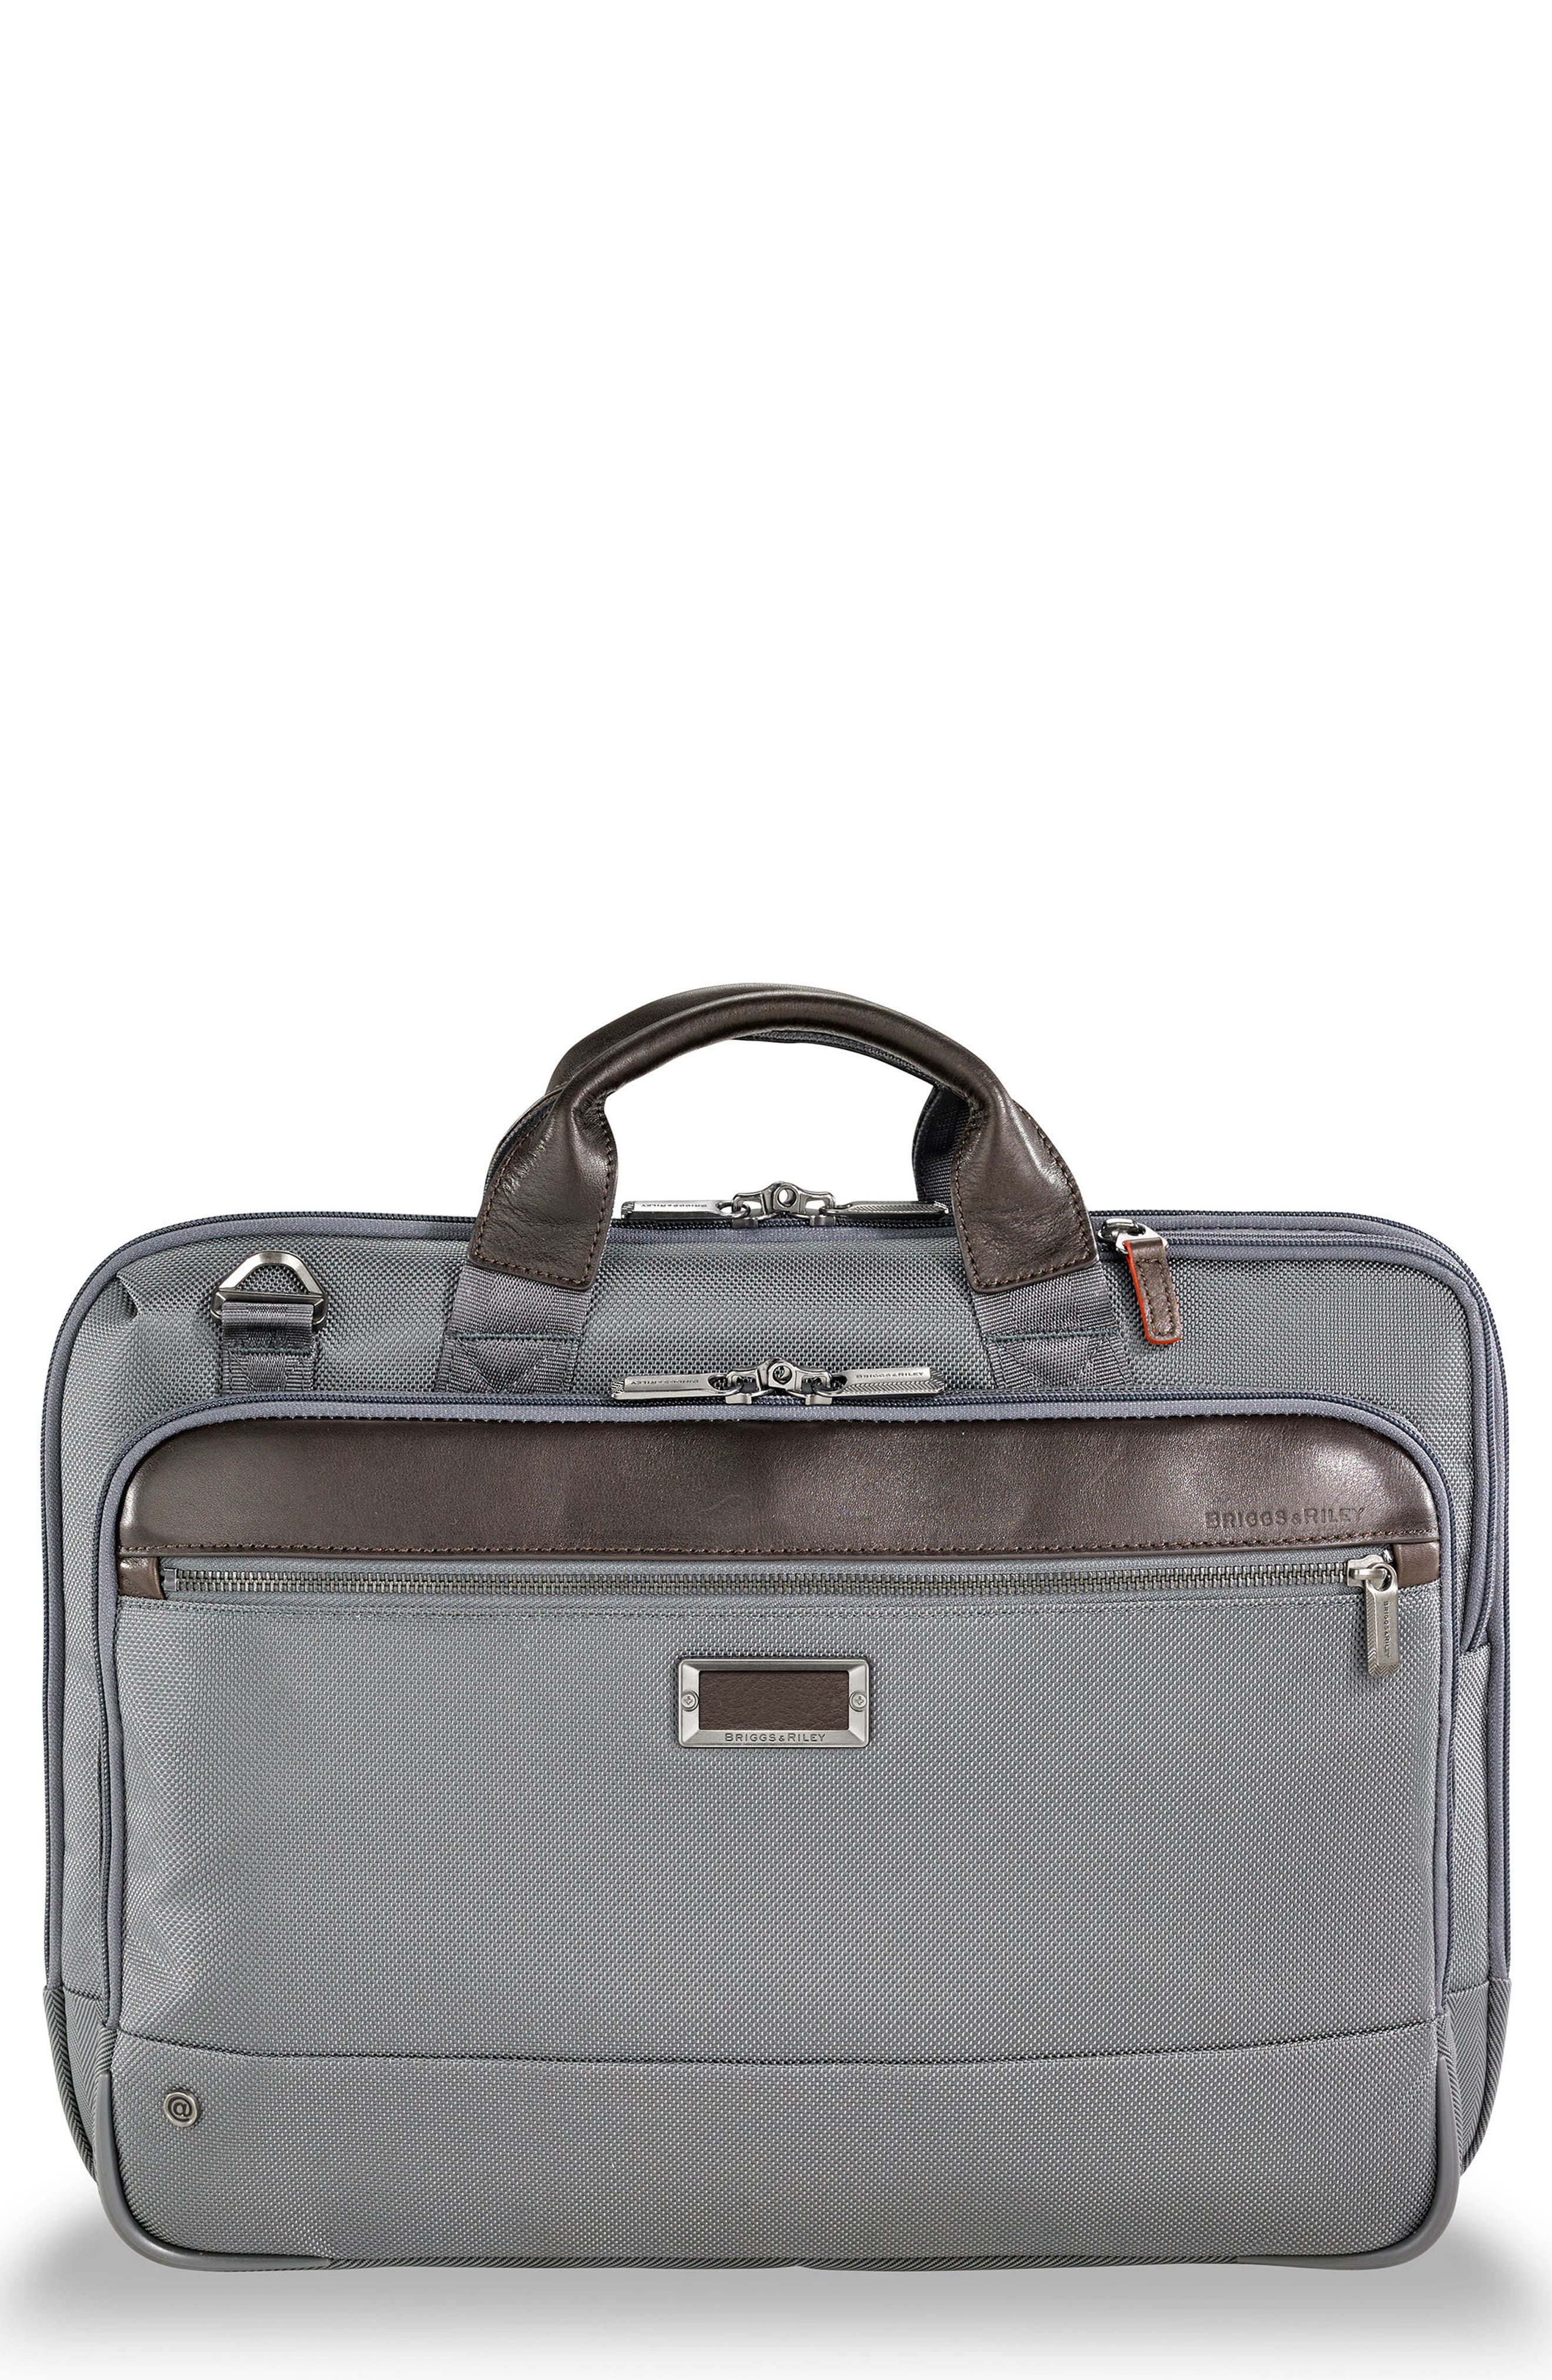 @work Slim Briefcase,                             Main thumbnail 1, color,                             Grey